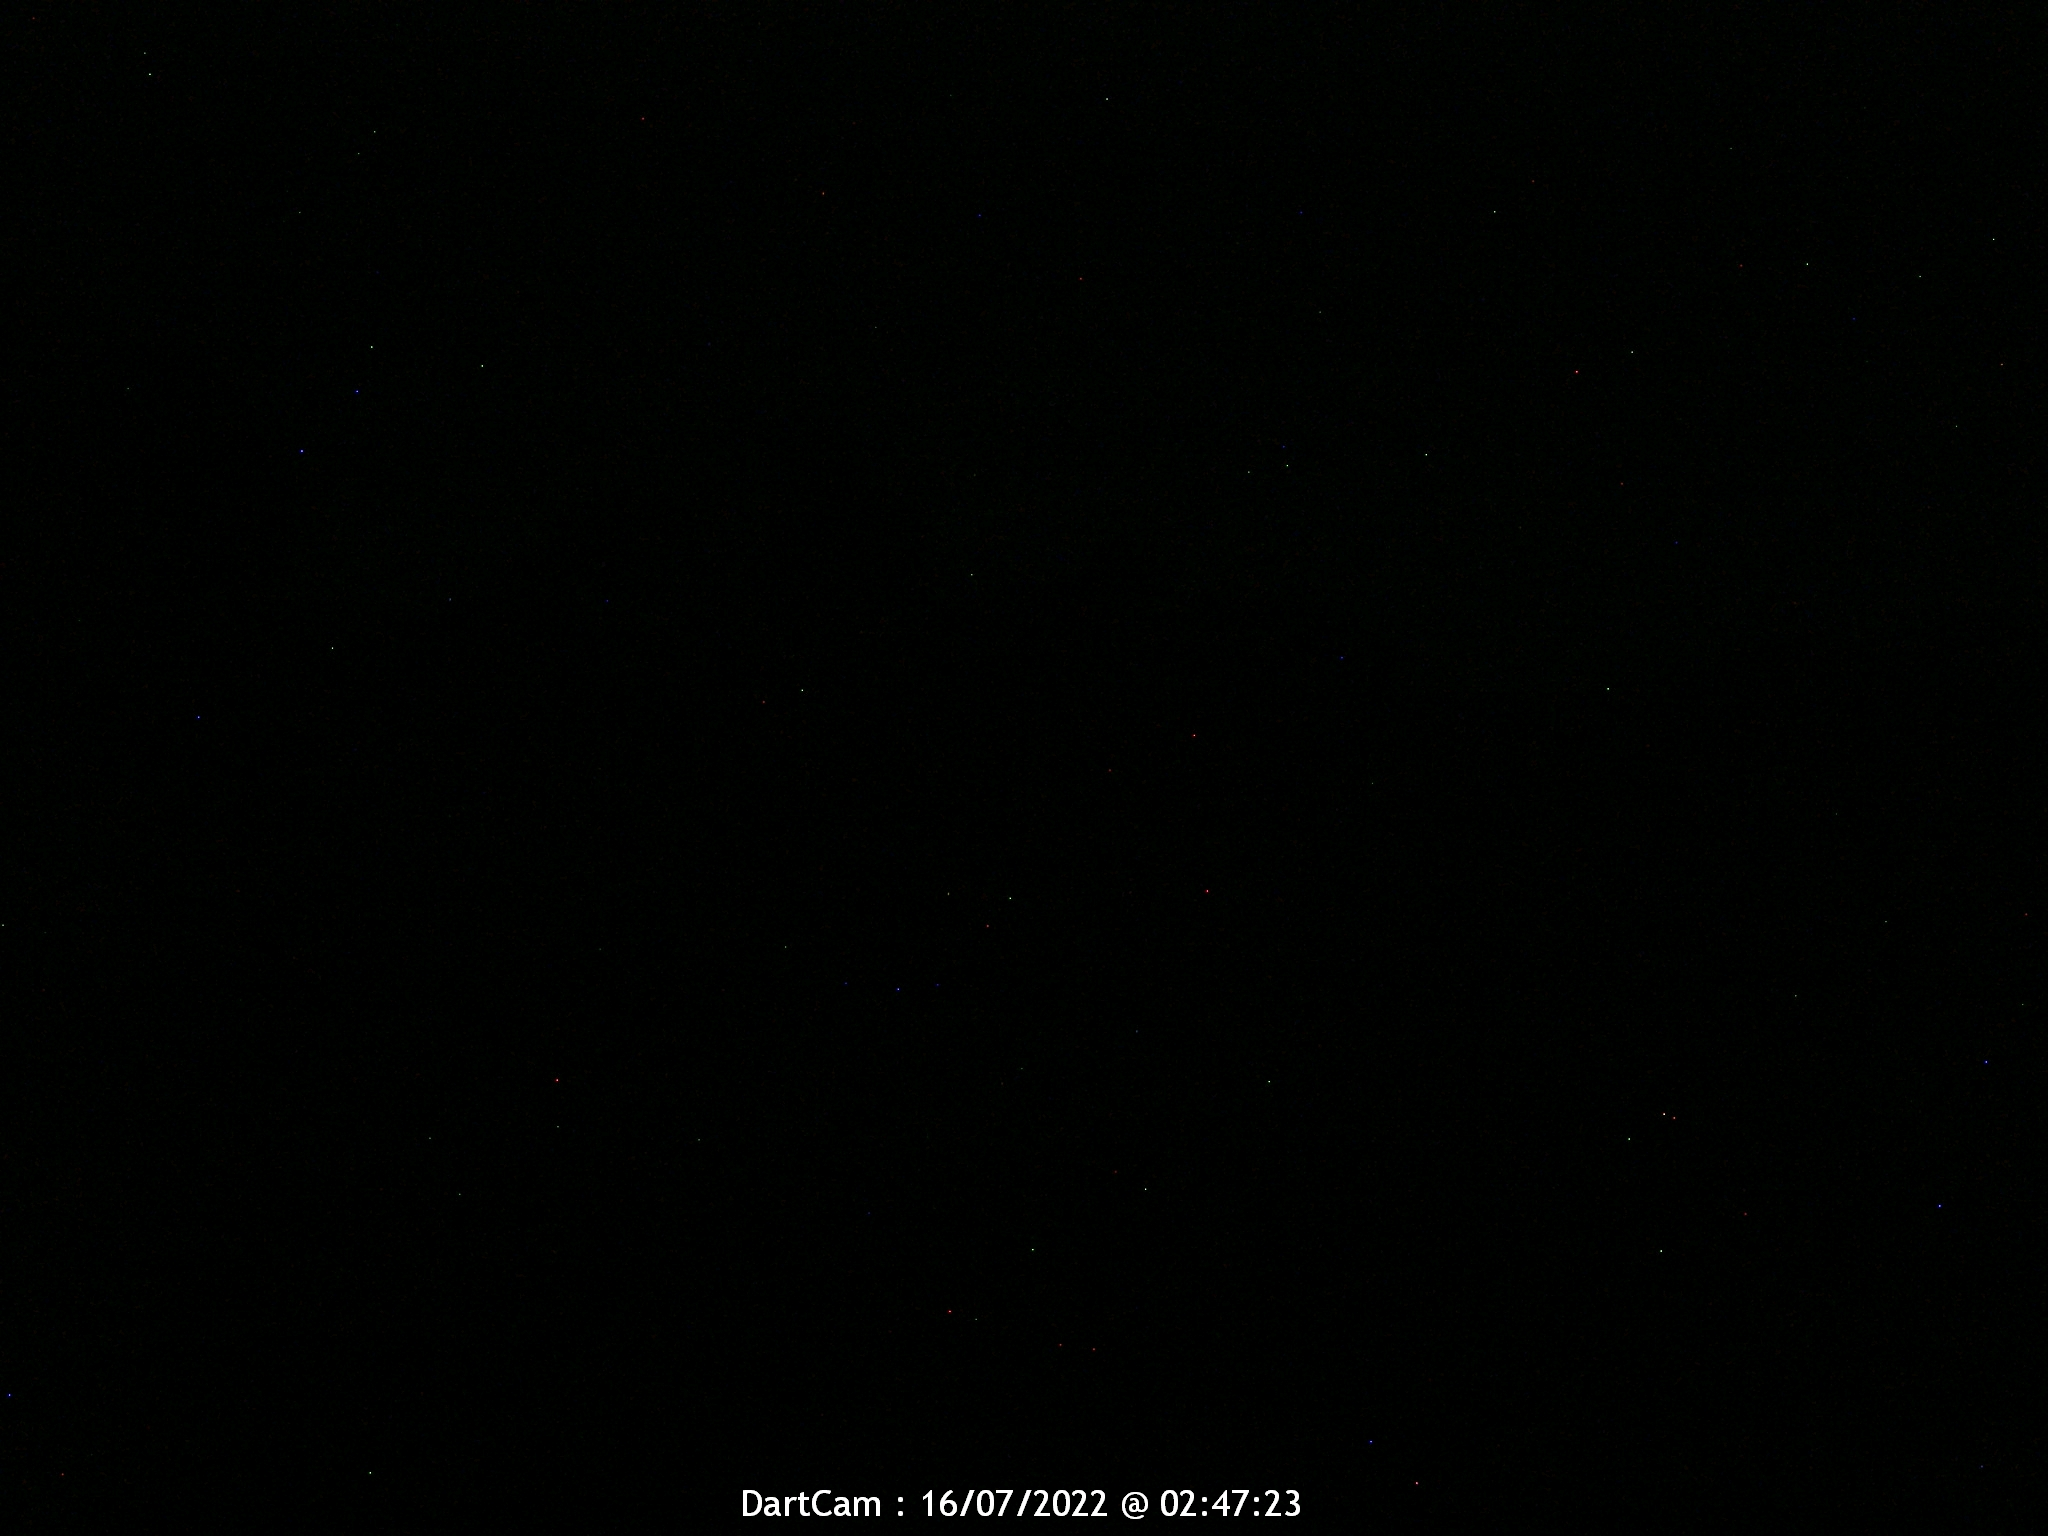 Dartmoor Fri. 02:49